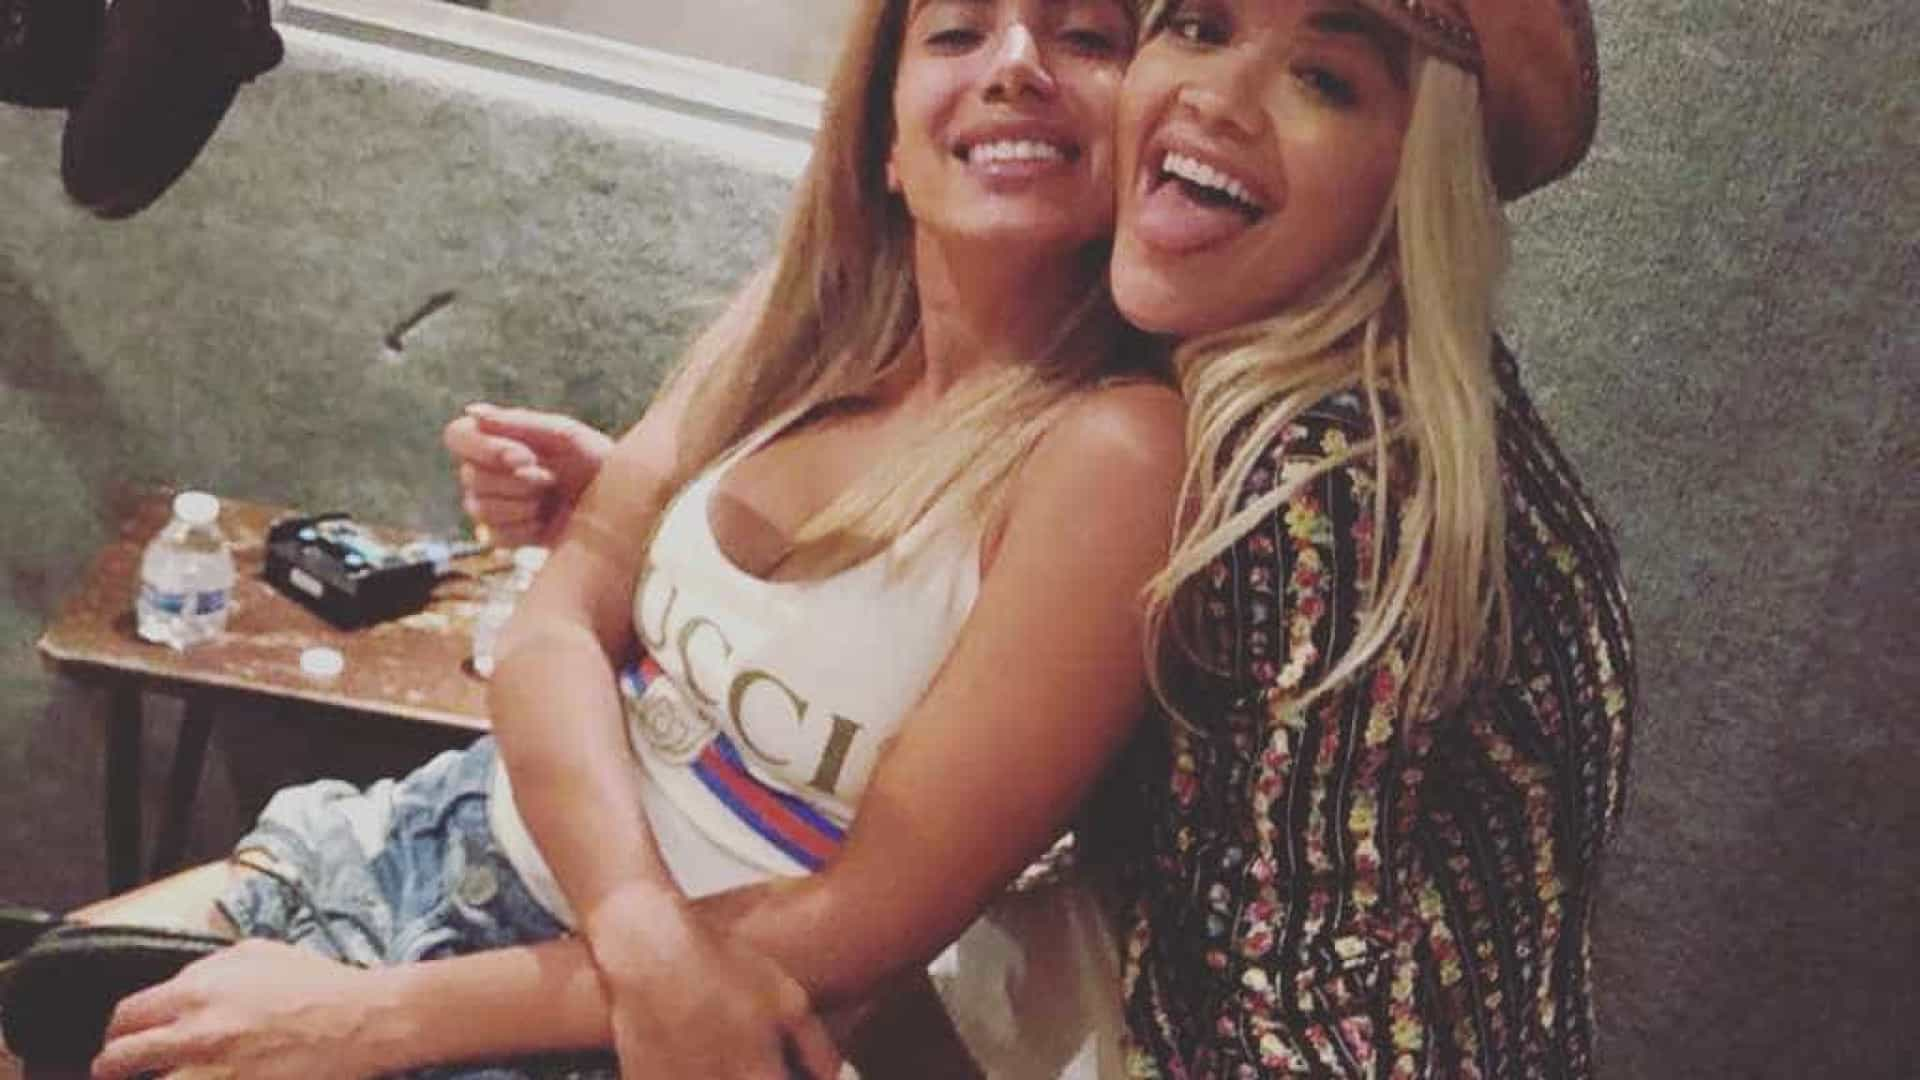 Fotos de Rita Ora e Anitta deixam fãs a 'delirar' com possível dueto